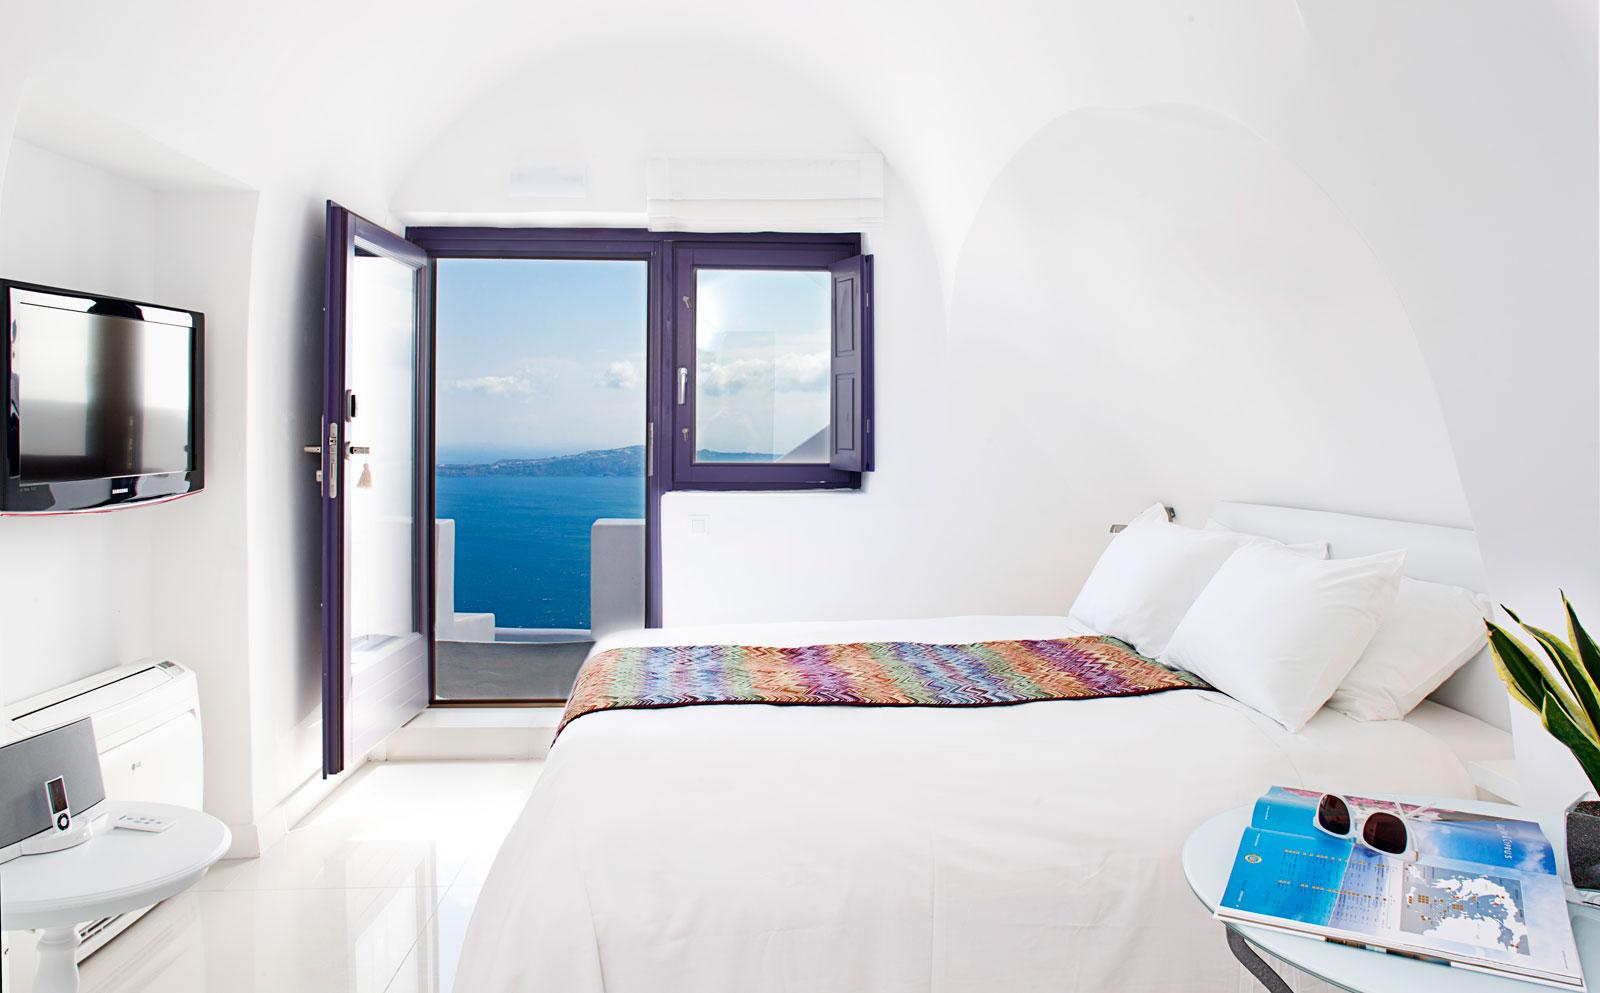 Where to stay in Santorini, Chromata 5* Hotel